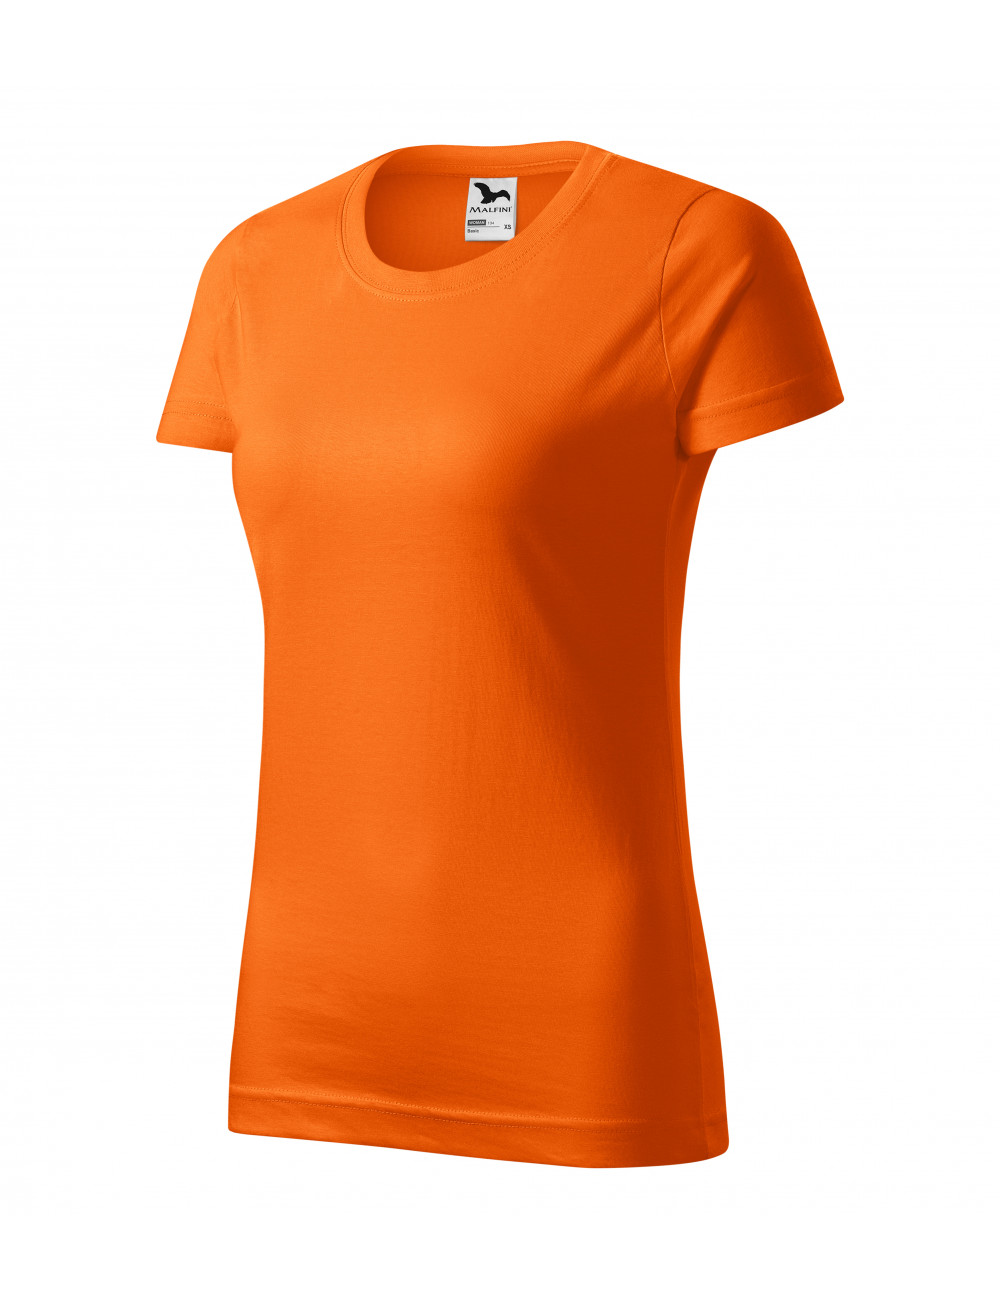 Adler MALFINI Koszulka damska Basic 134 pomarańczowy